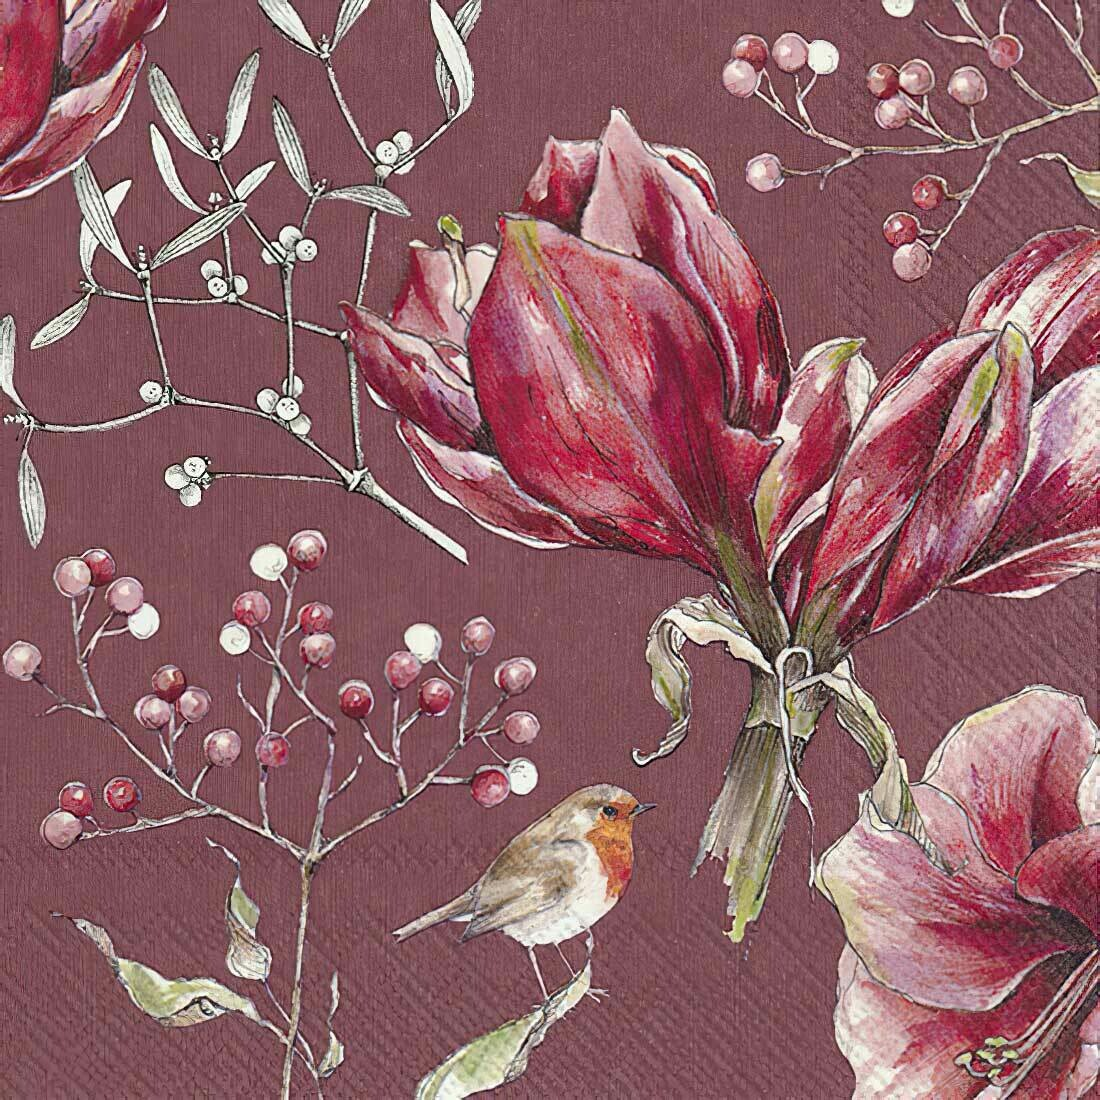 Decoupage Paper Napkins - Floral - Winter Amaryllis (1 Sheet)